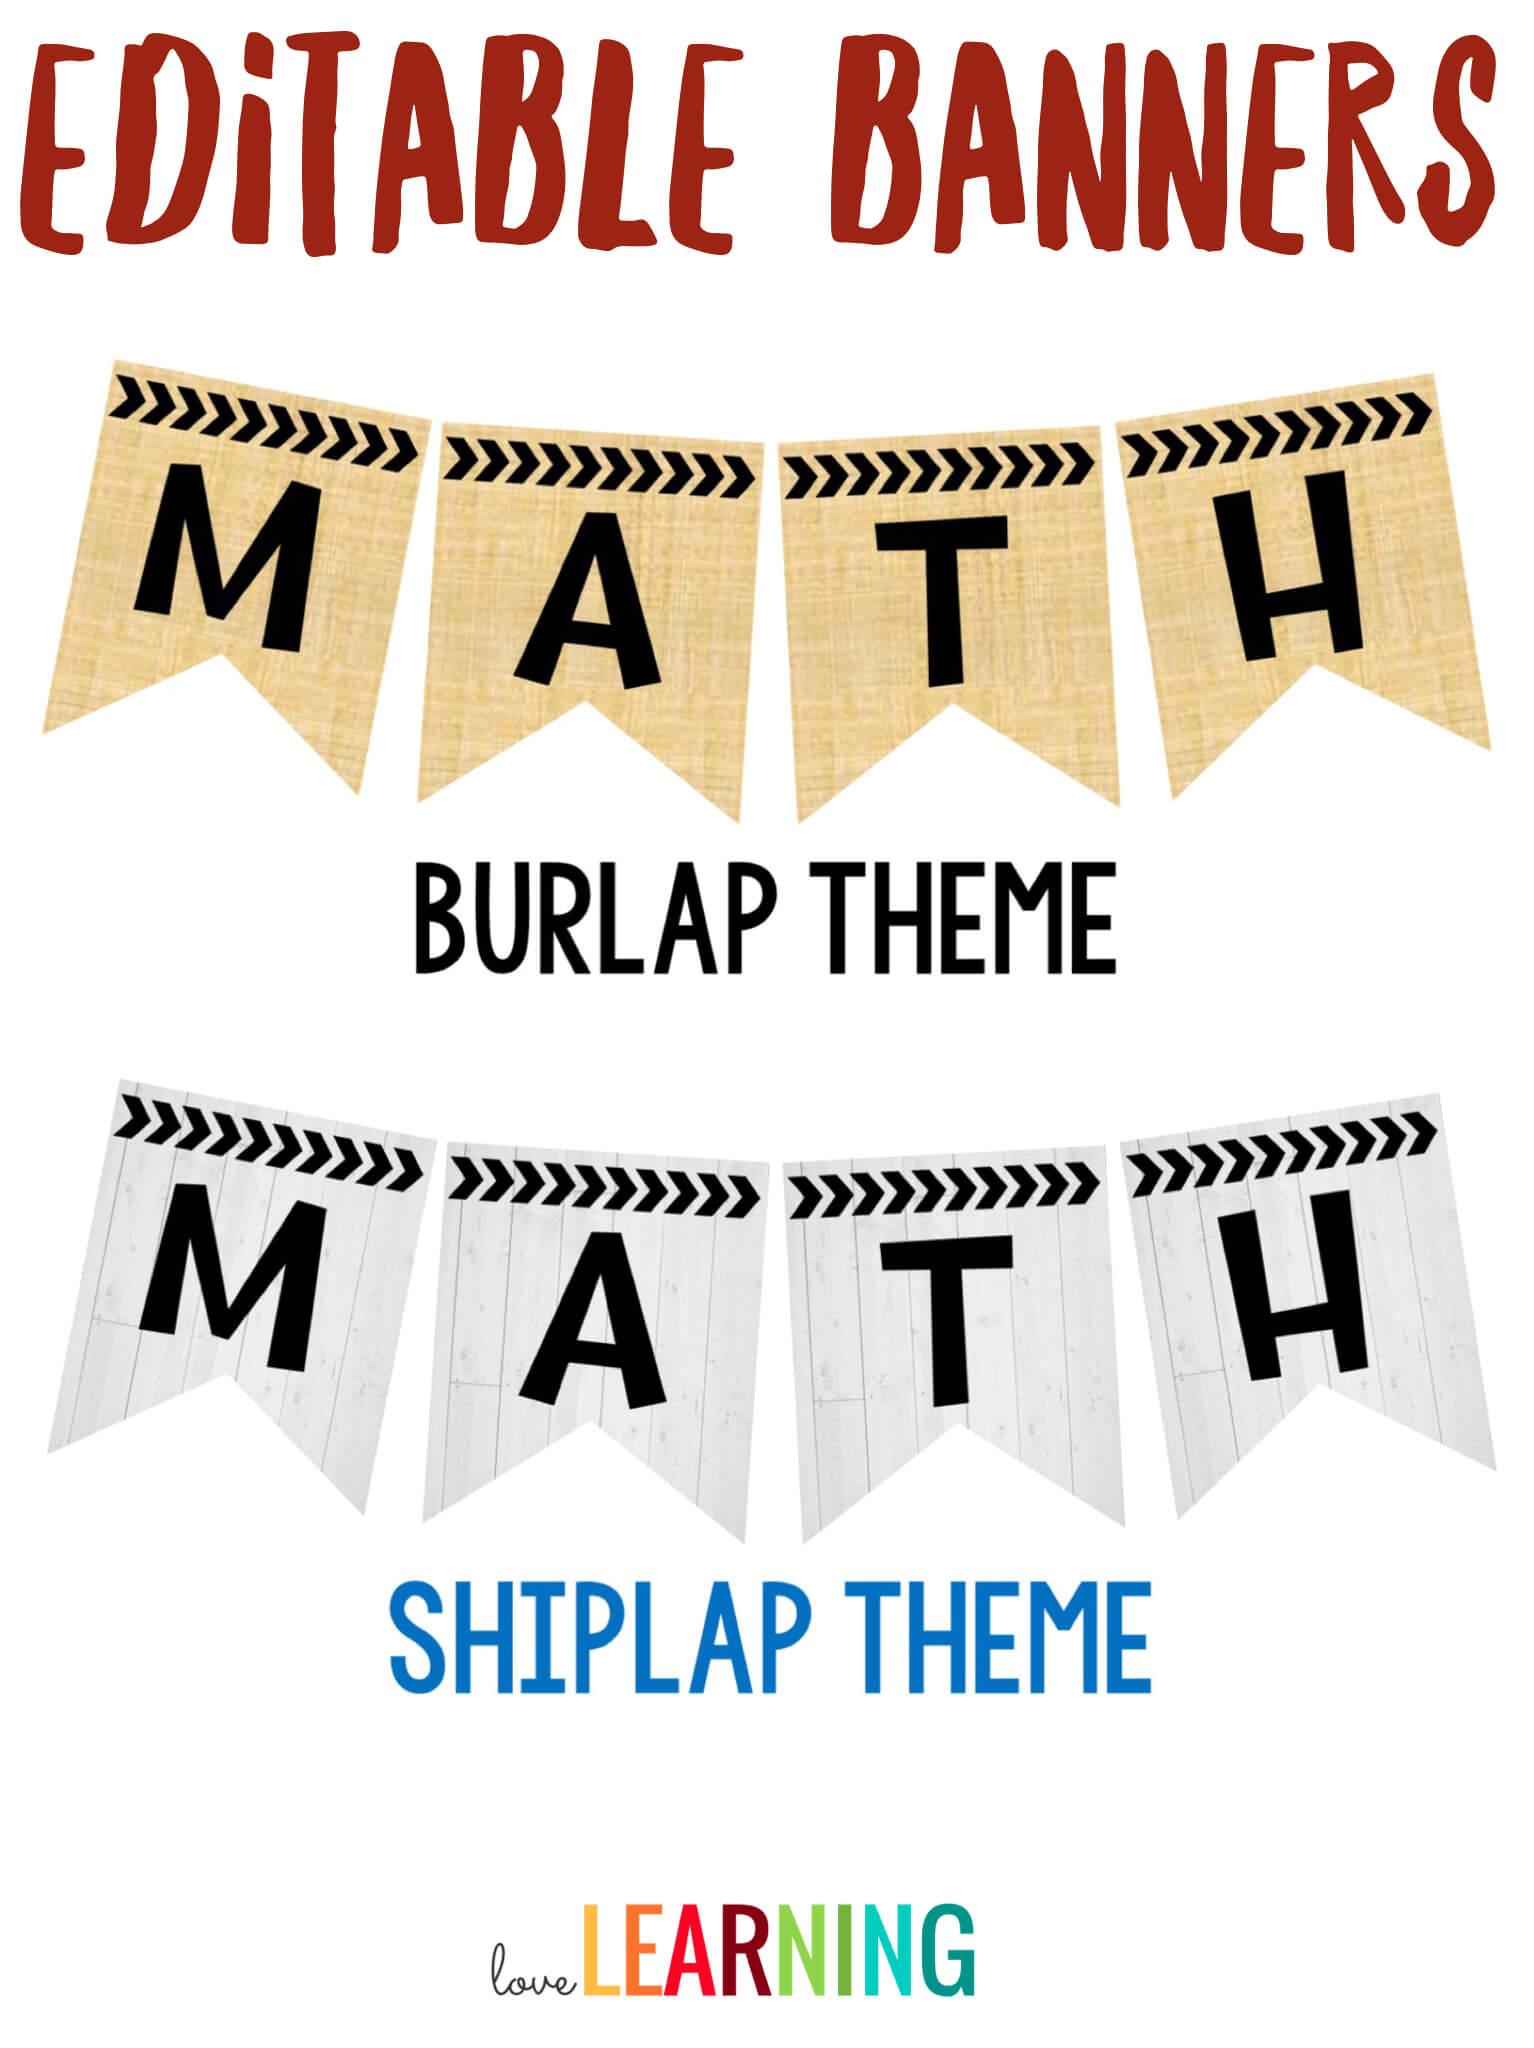 Editable Subject Banners - Burlap Theme | Classroom Regarding Classroom Banner Template